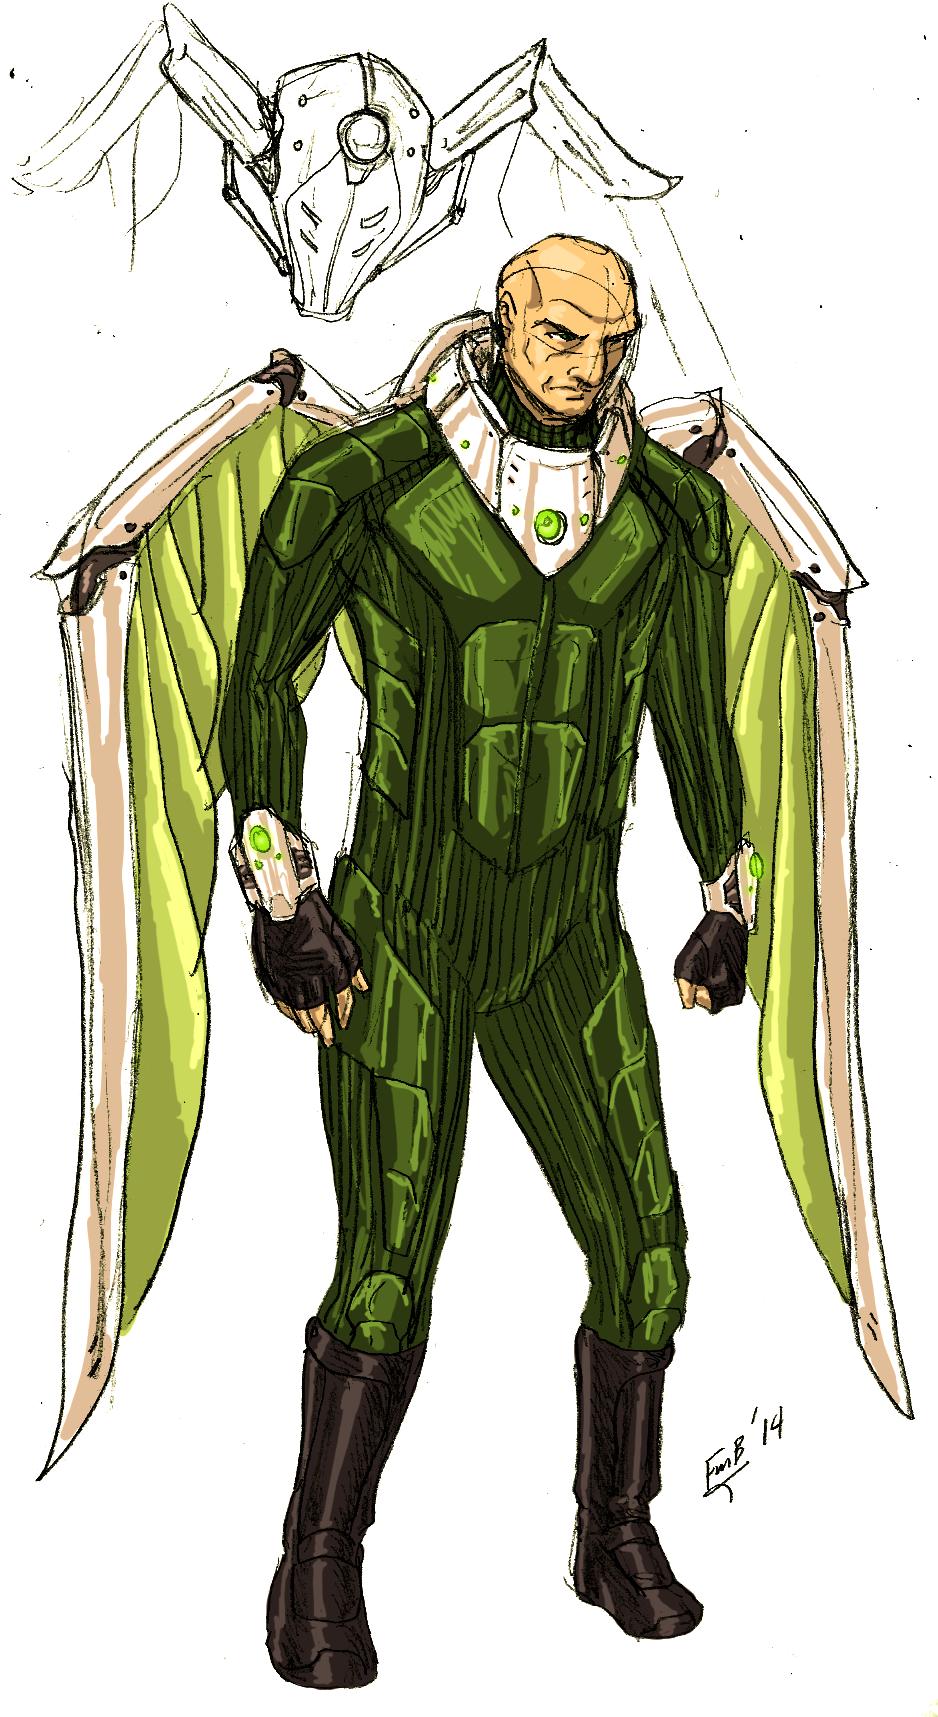 Blackie Drago (Earth-1111)